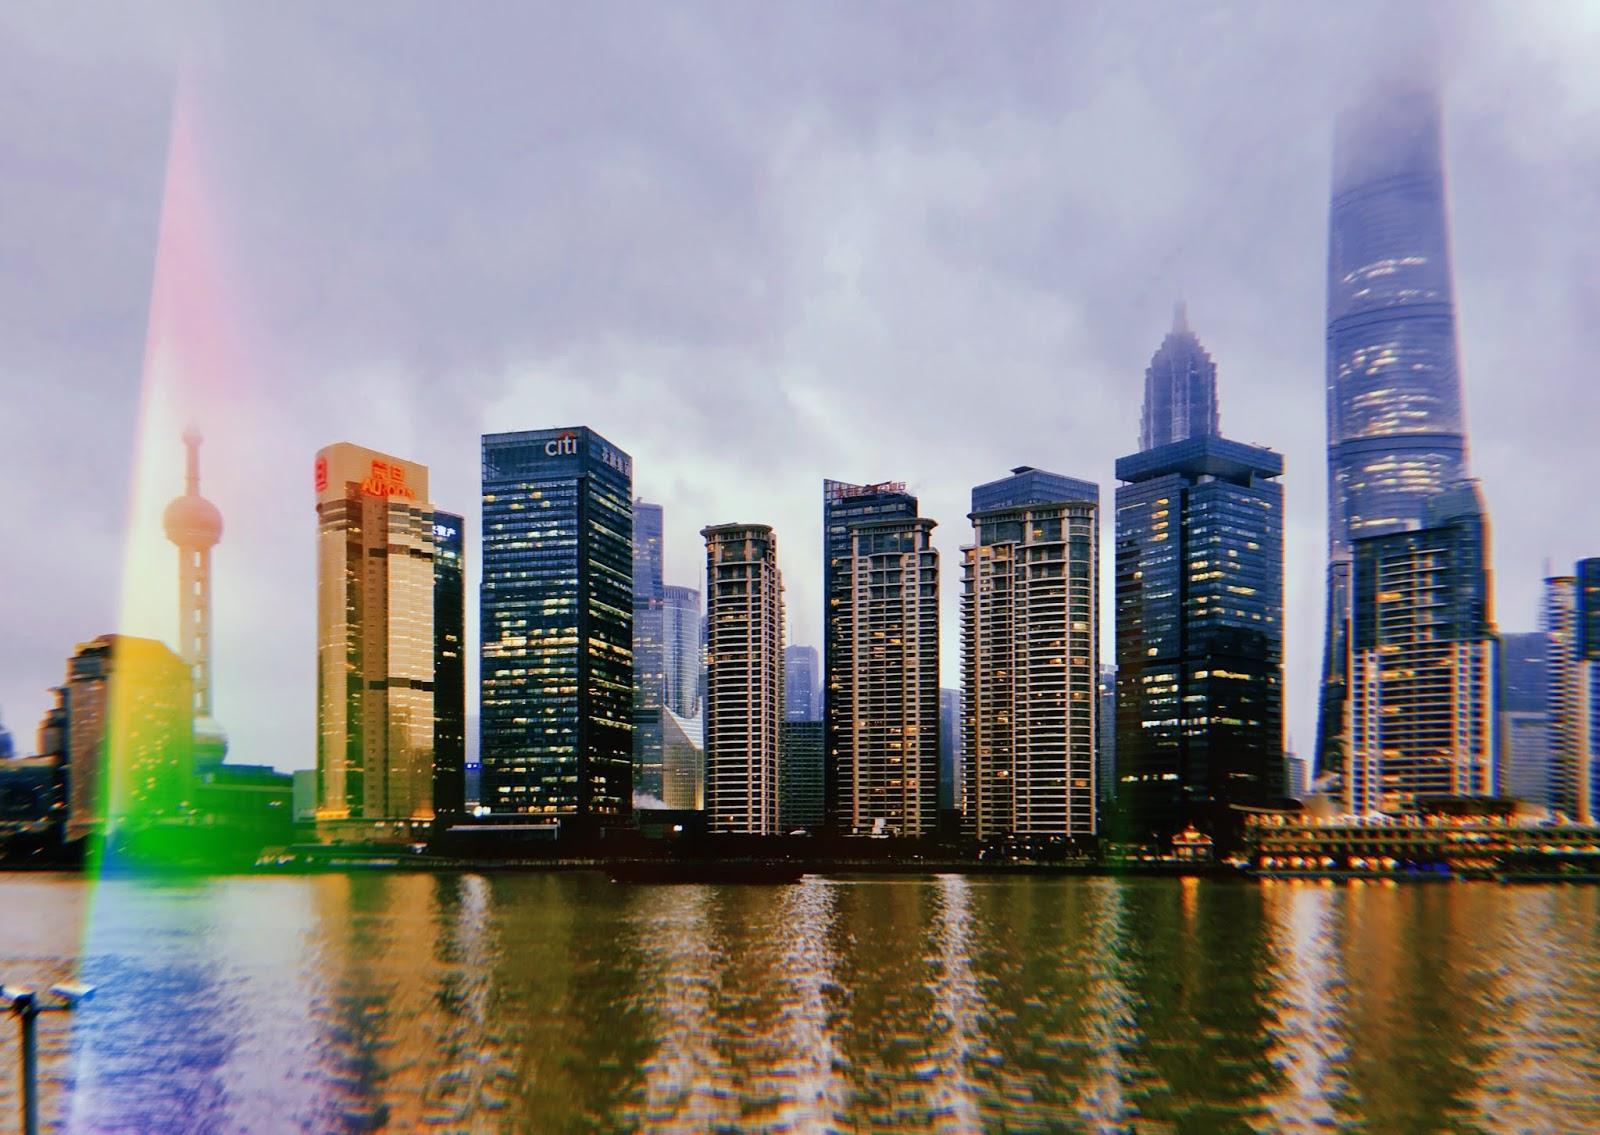 A WEEKEND IN SHANGHAI: JANUARY 2020